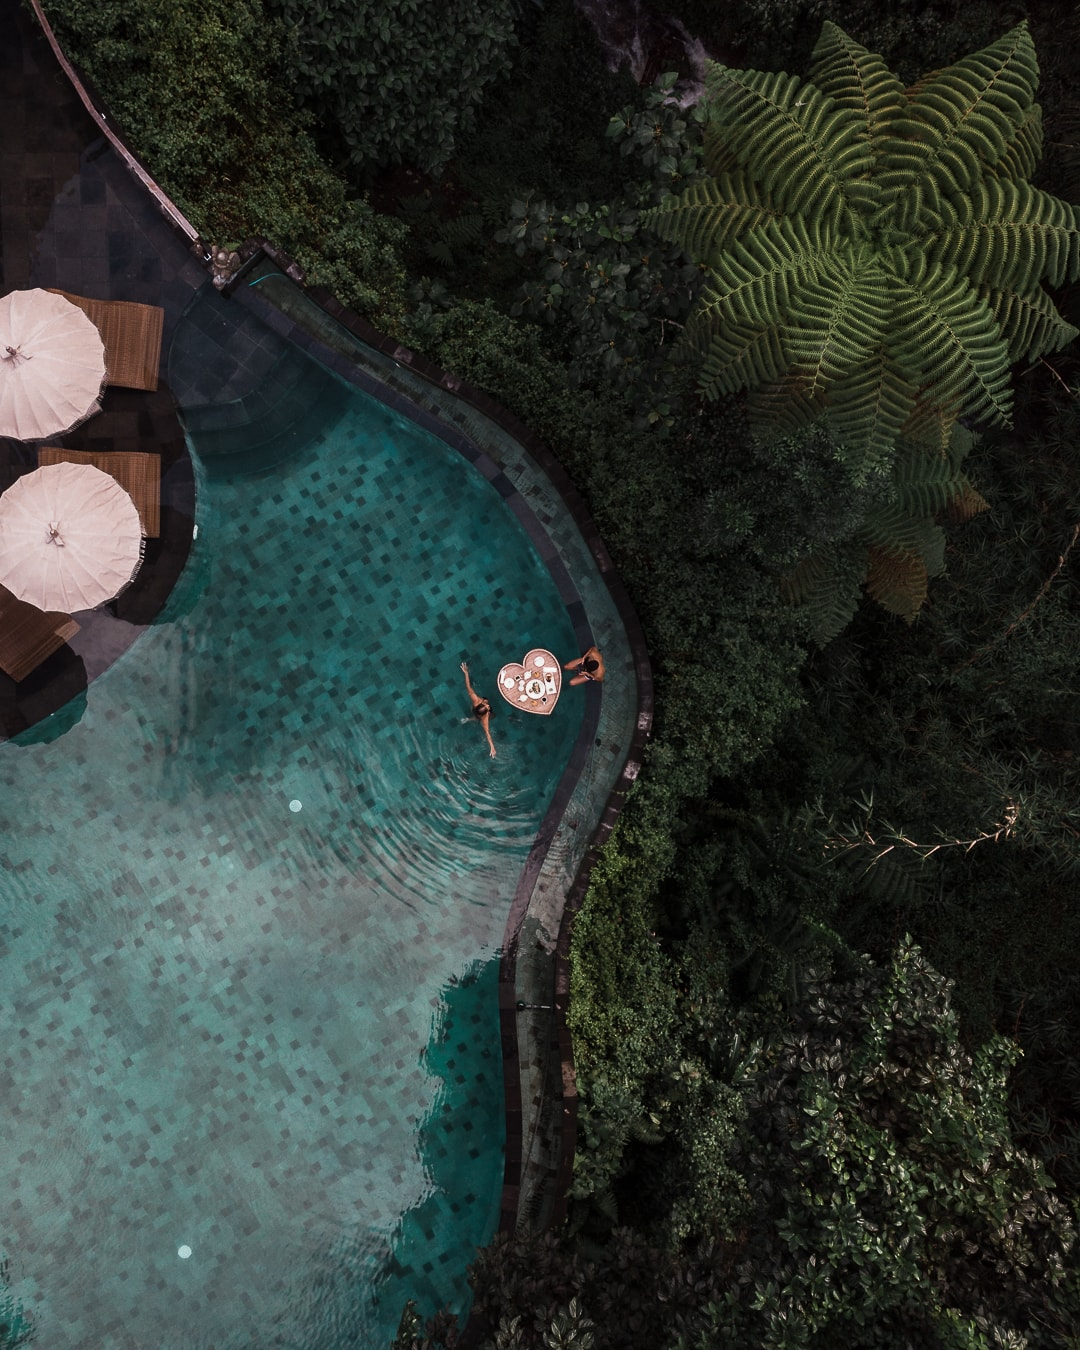 Drone image of Travelermentality having breakfast in the pool water of the Aksari Resort in Bali, Indonesia.